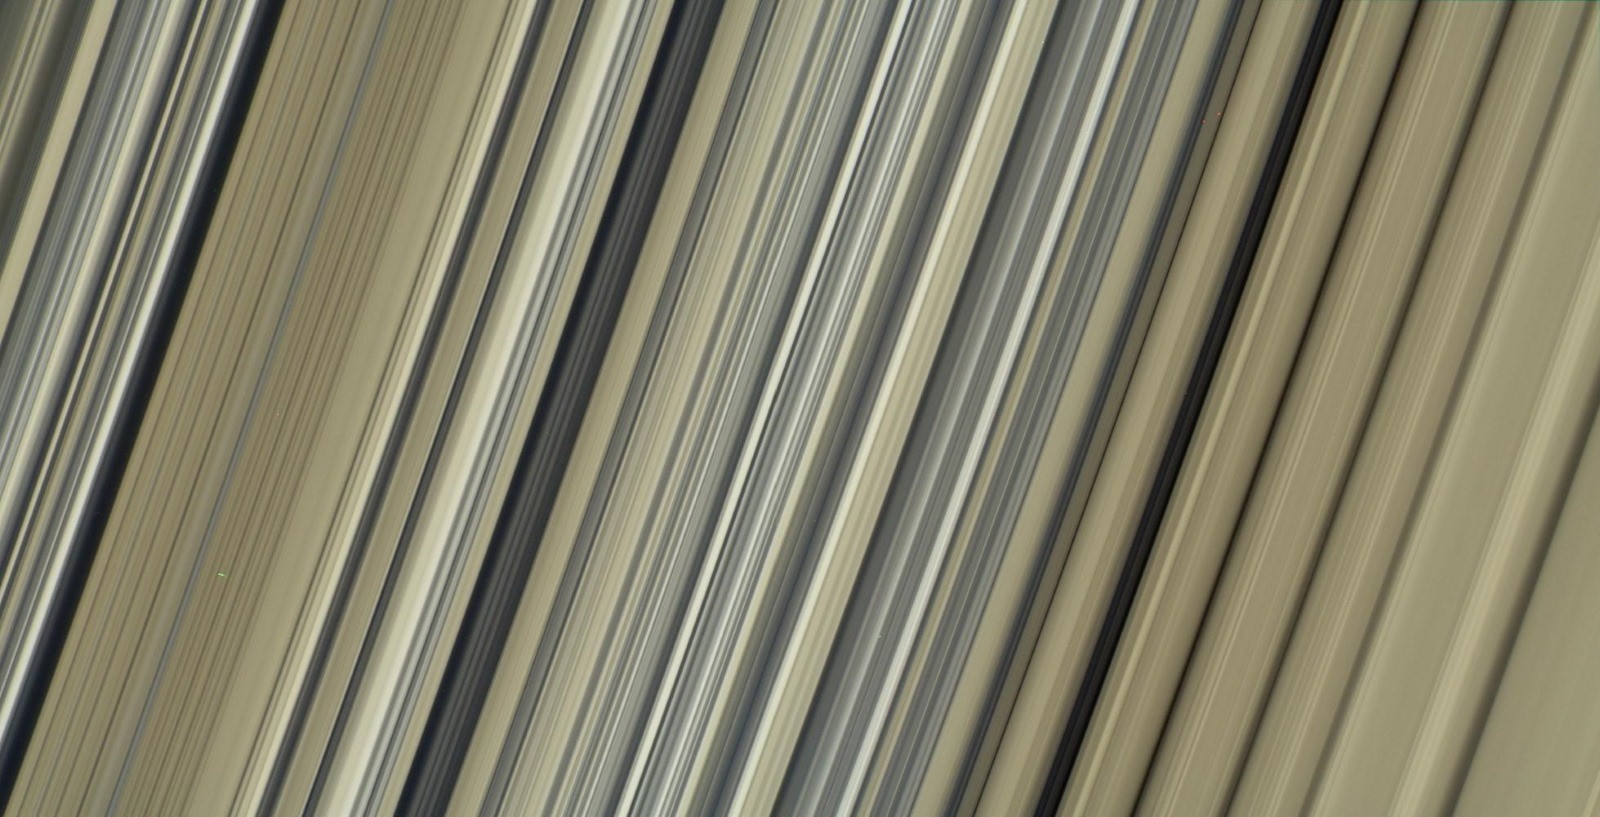 Cassini anneau S